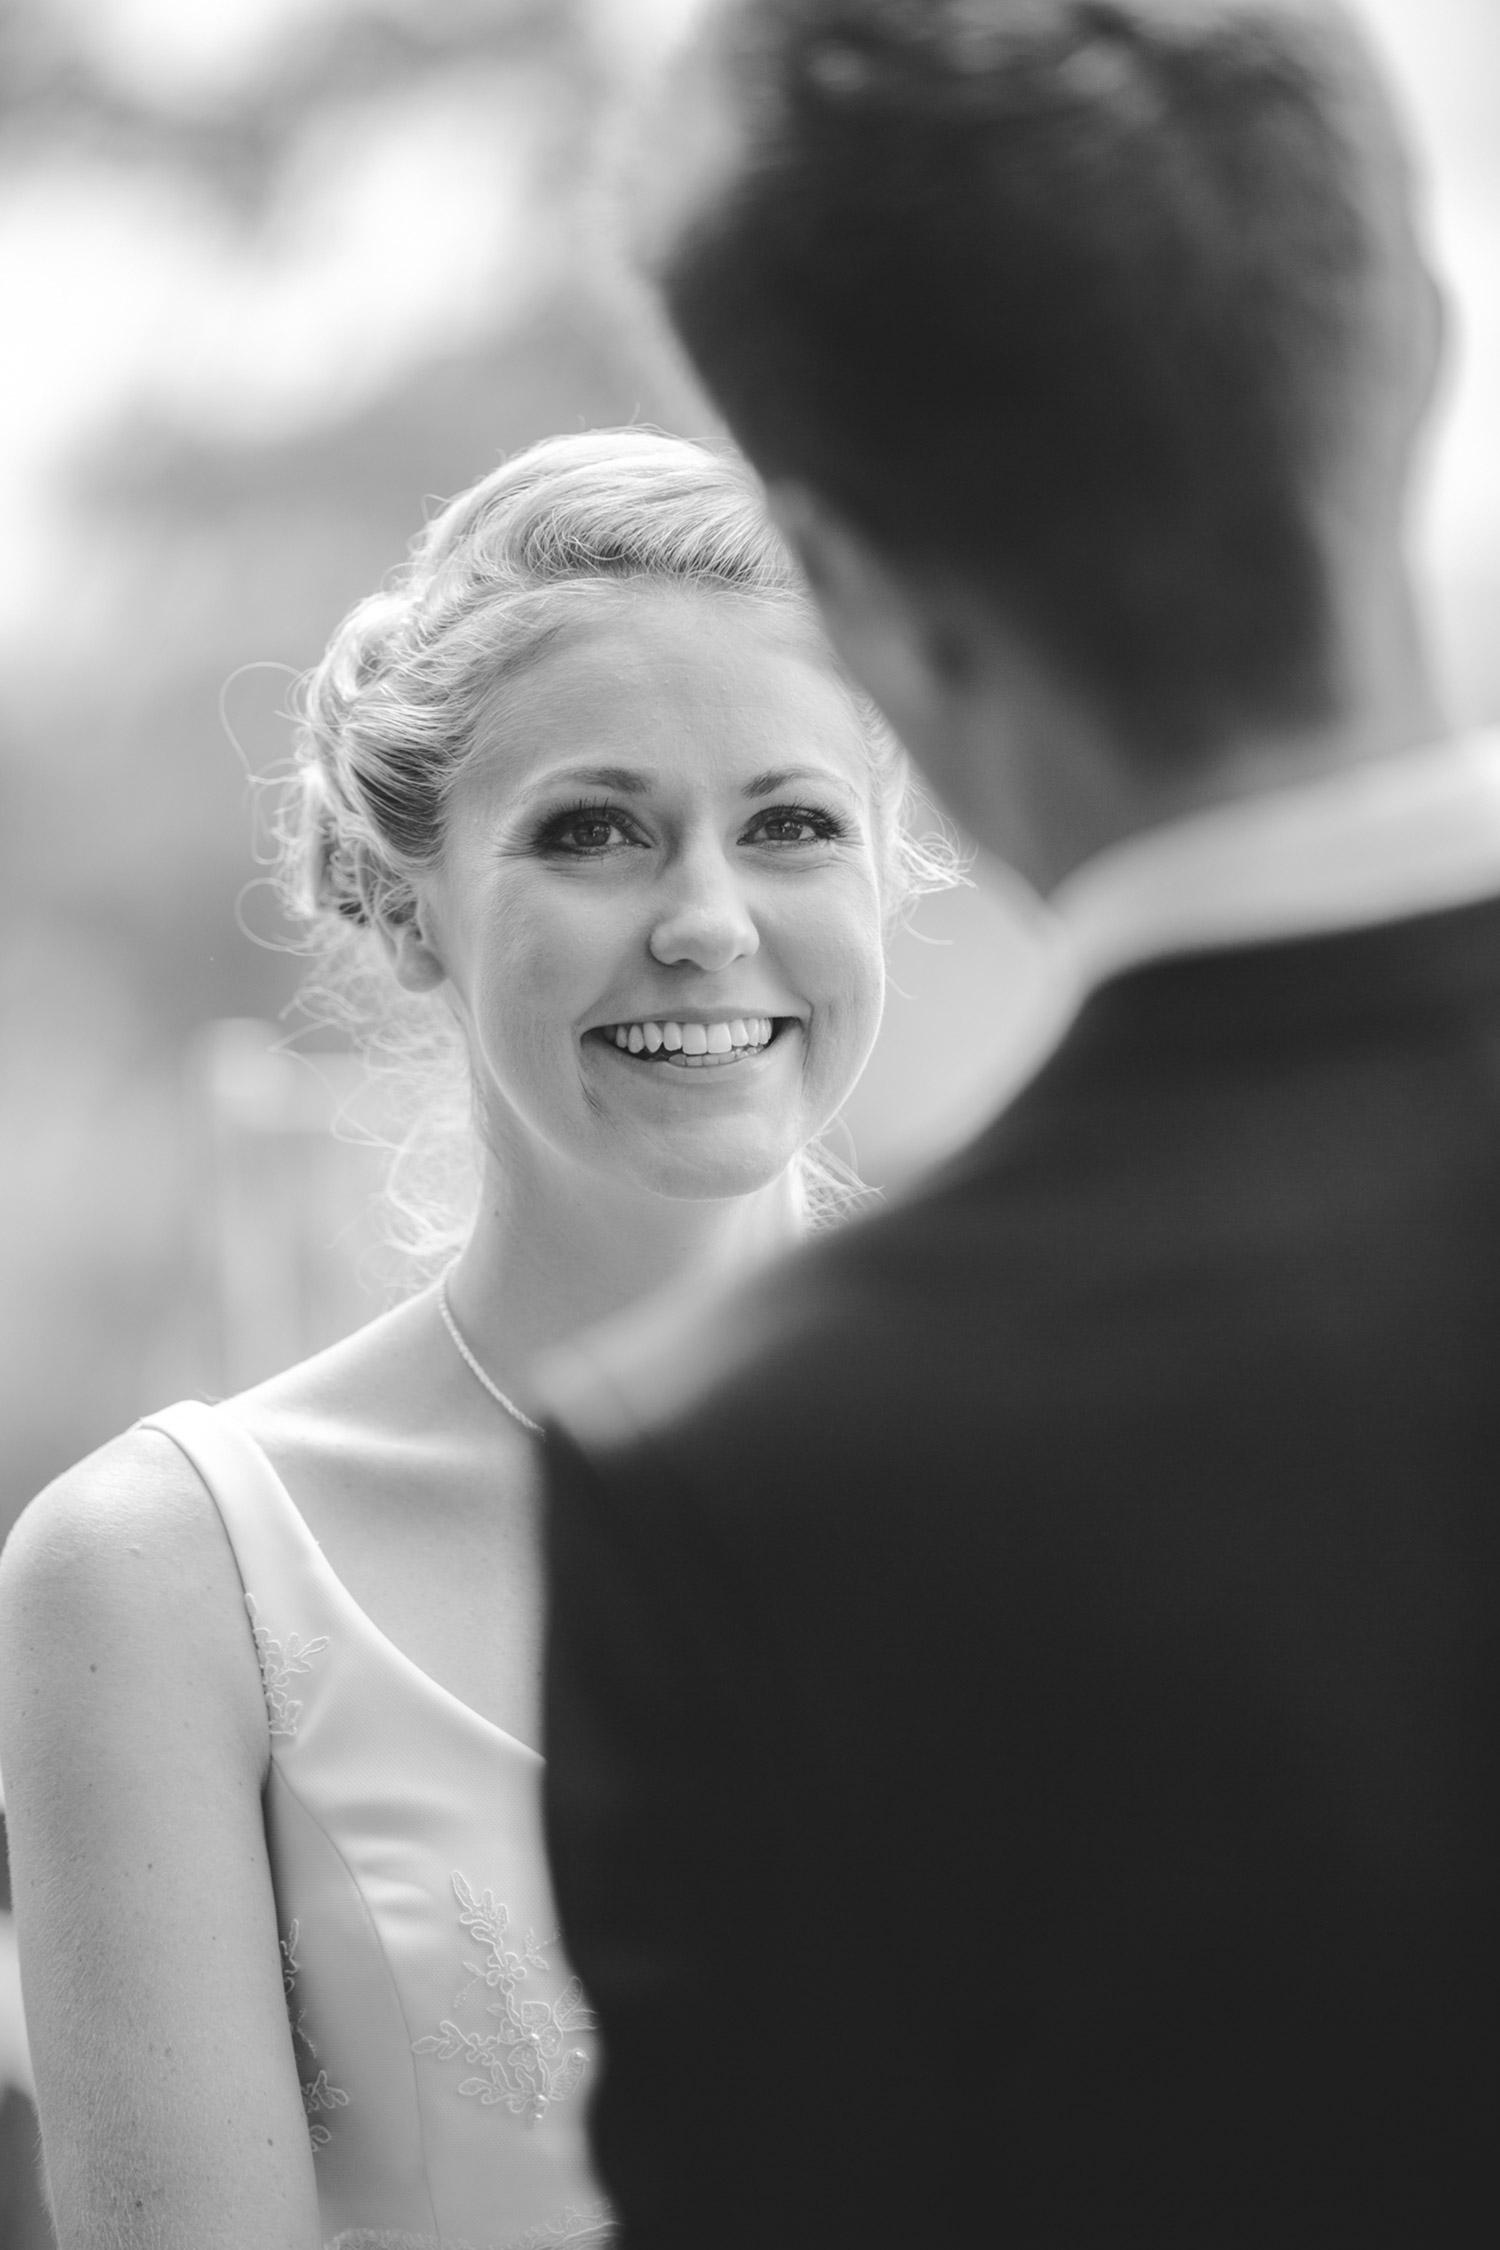 33-sunshine-coast-wedding-photography-all-the-love-in-the-world-noosa-mooloolaba-glasshouse-brisbane-katie-ryan5140.jpg